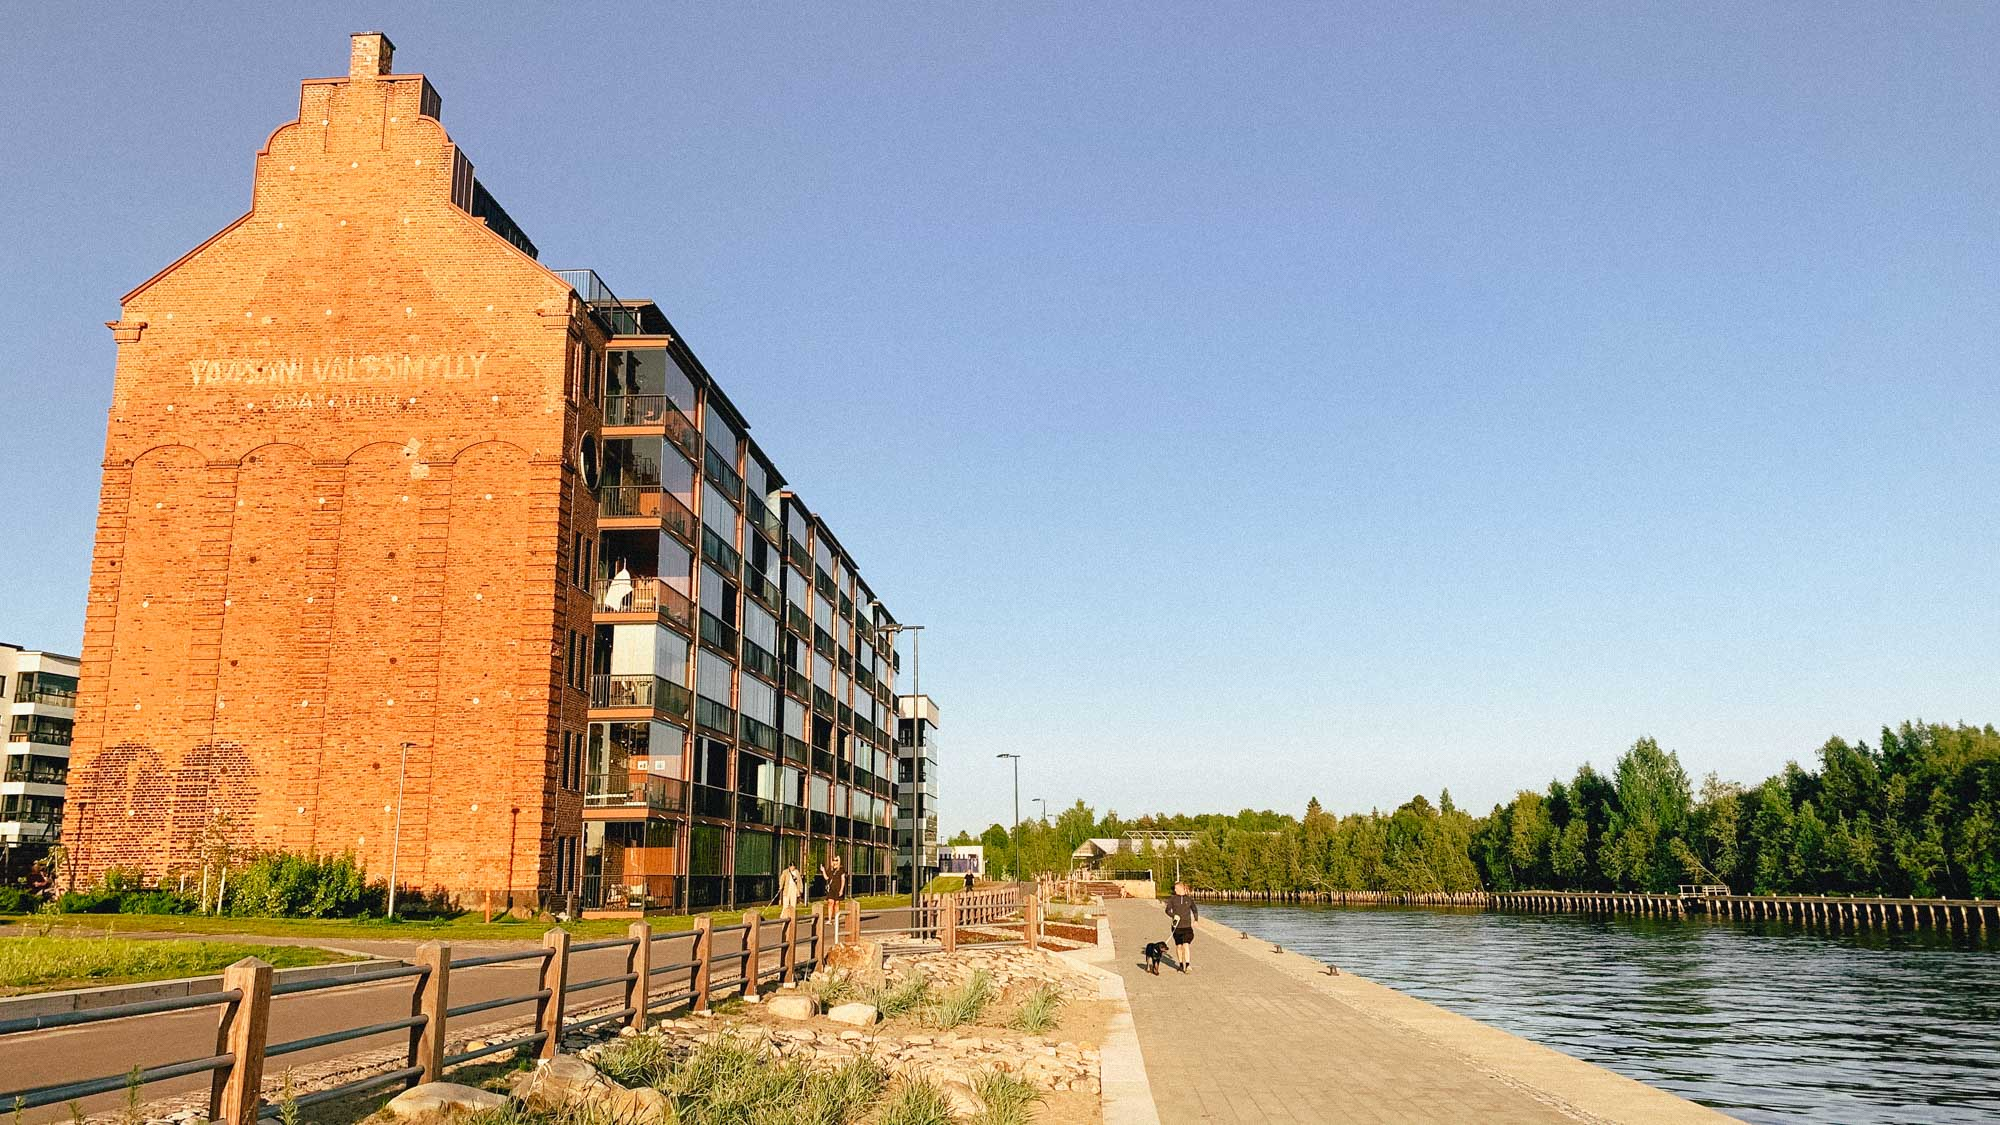 Meri-Toppila, Oulu